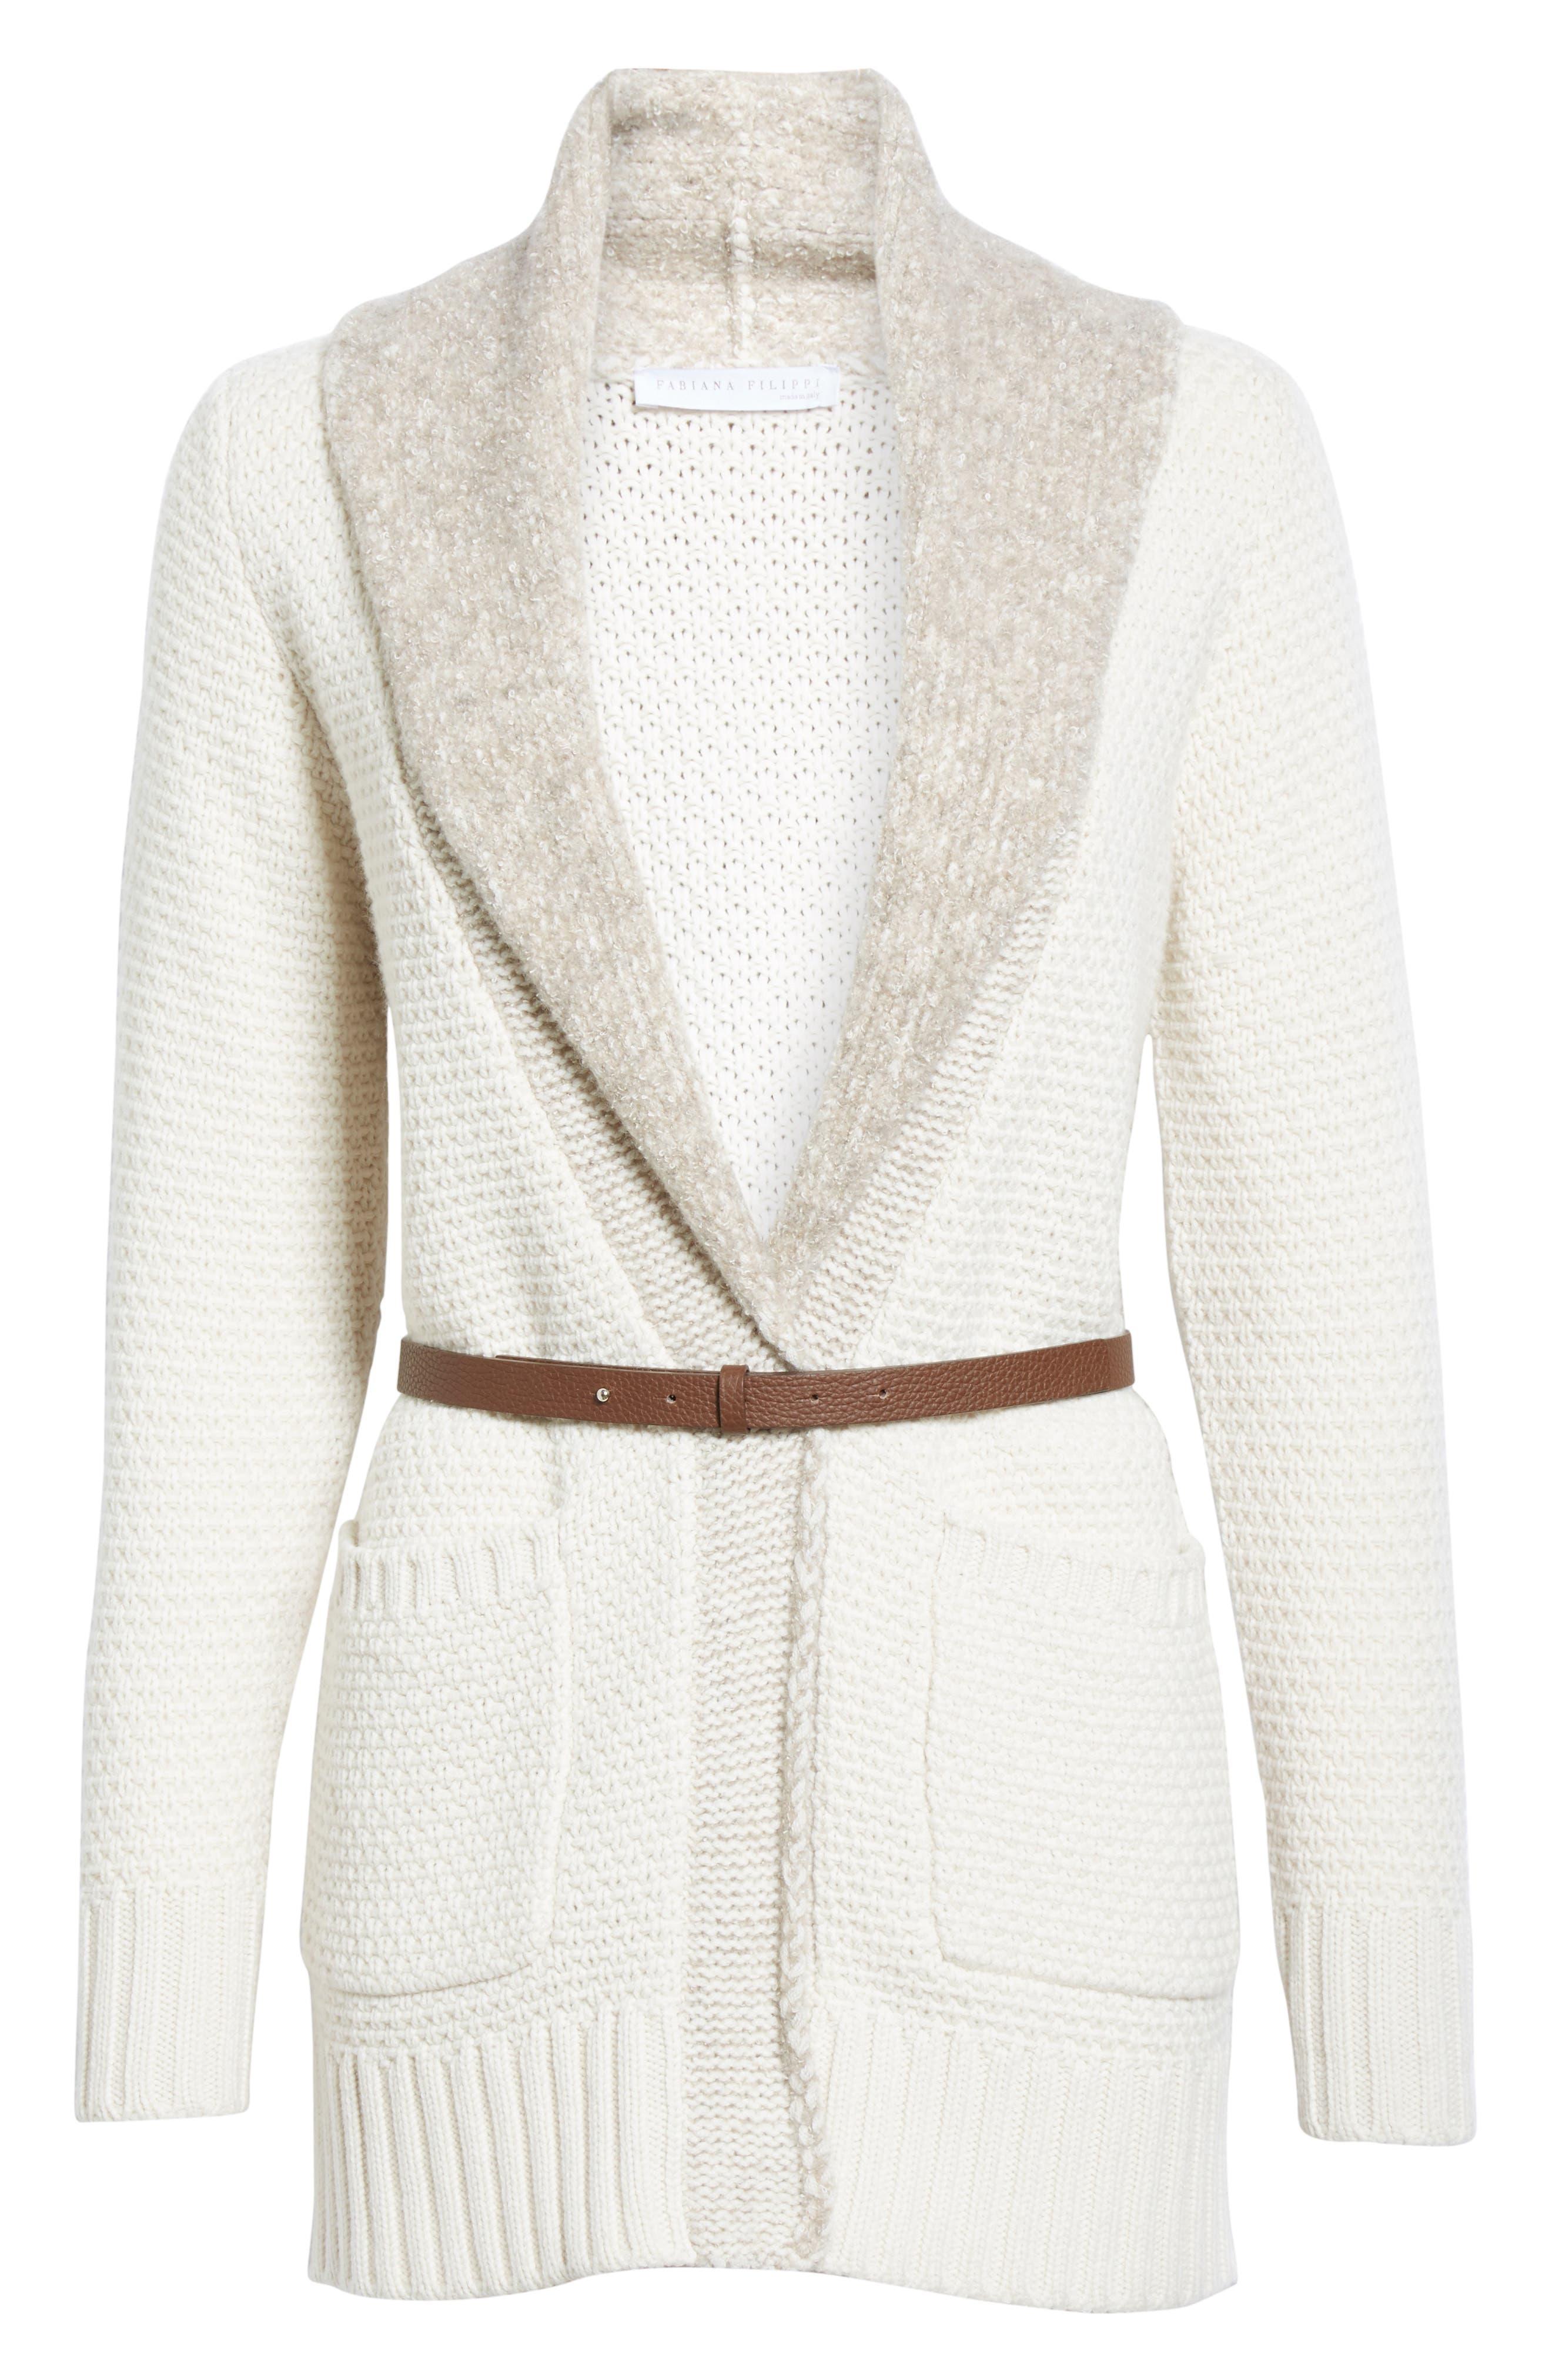 Alternate Image 4  - Fabiana Filippi Wool, Silk & Cashmere Knit Cardigan